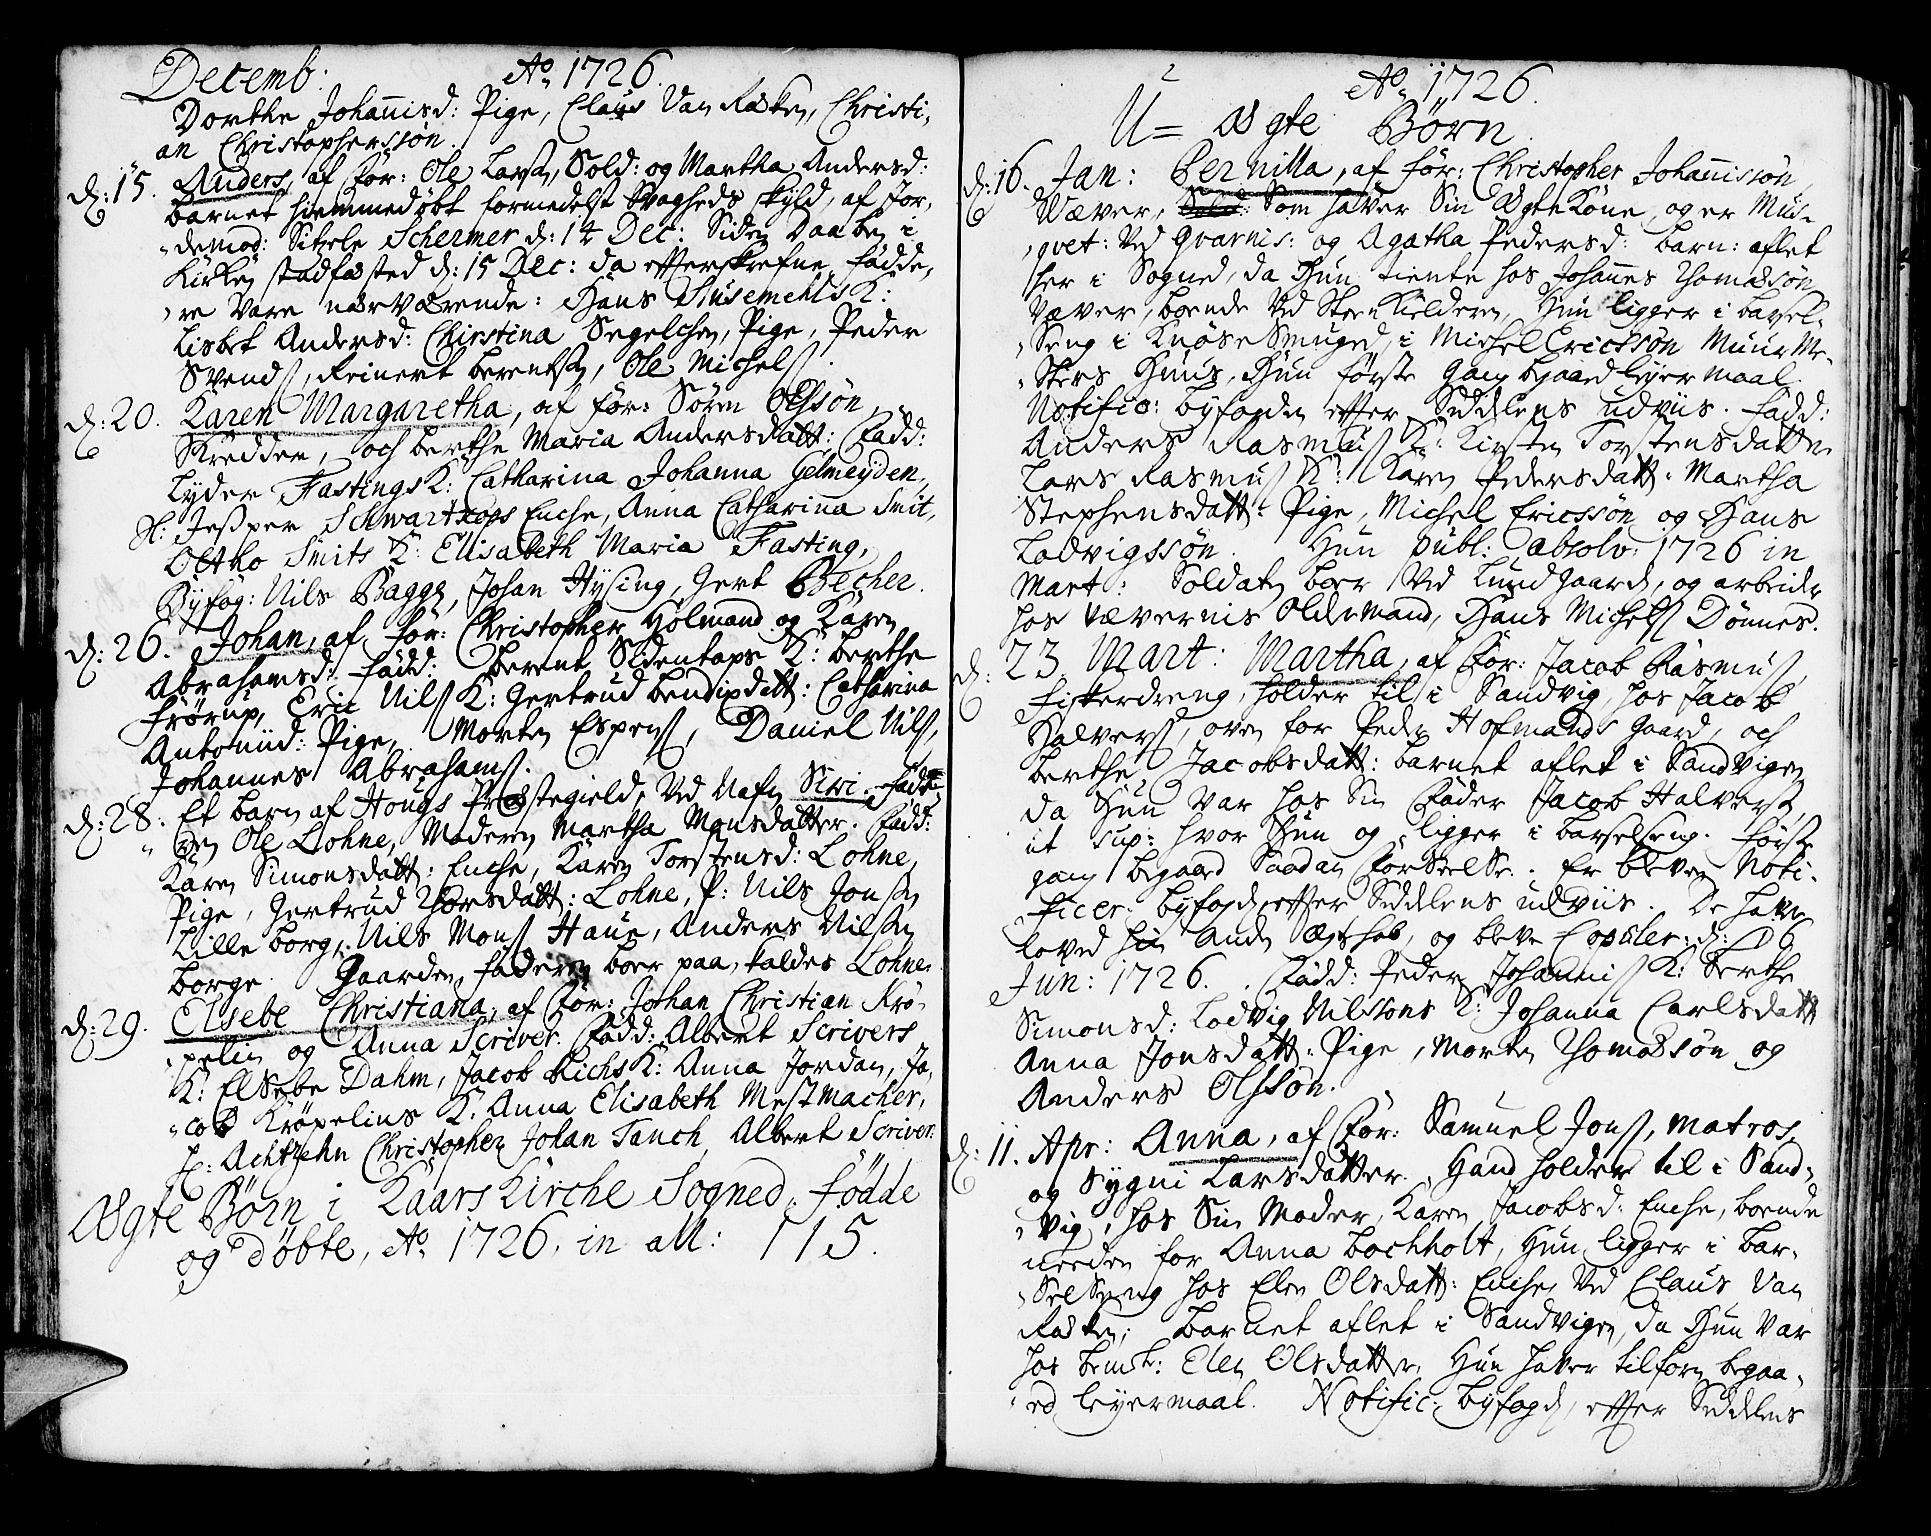 SAB, Korskirken Sokneprestembete, H/Haa/L0004: Ministerialbok nr. A 4, 1720-1750, s. 68